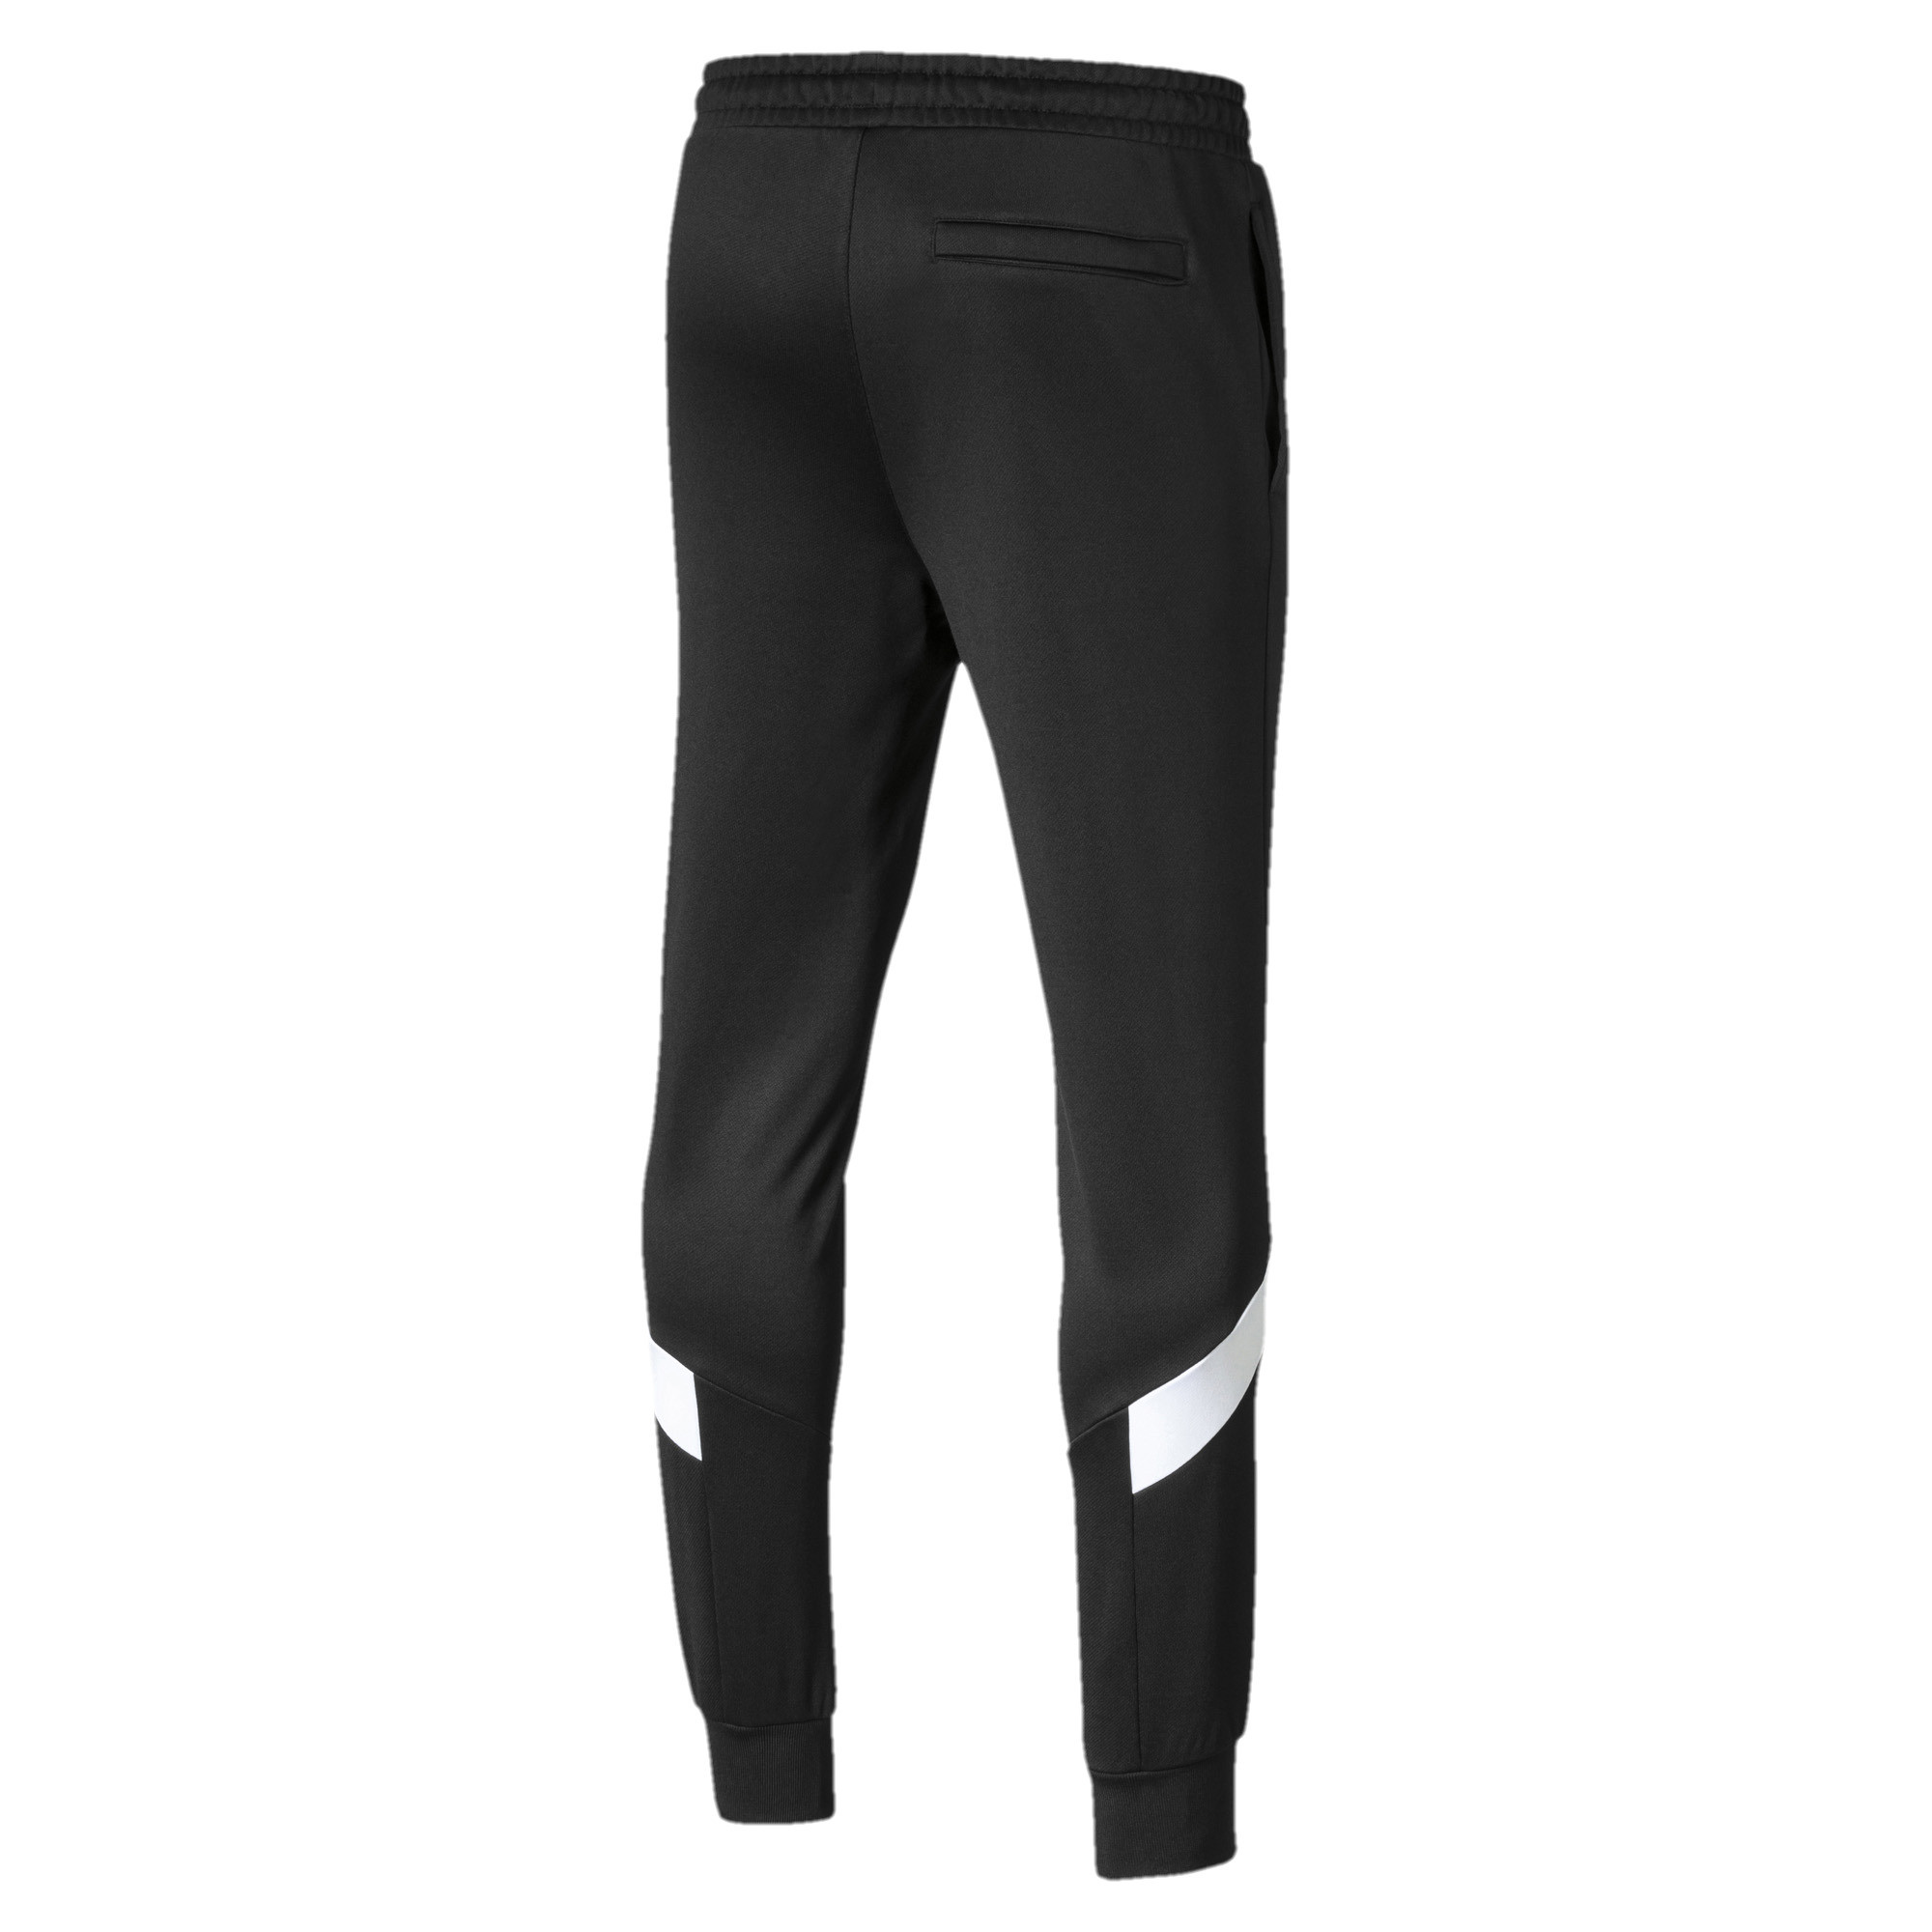 PUMA-Iconic-MCS-Men-039-s-Track-Pants-Men-Knitted-Pants-Sport-Classics thumbnail 8